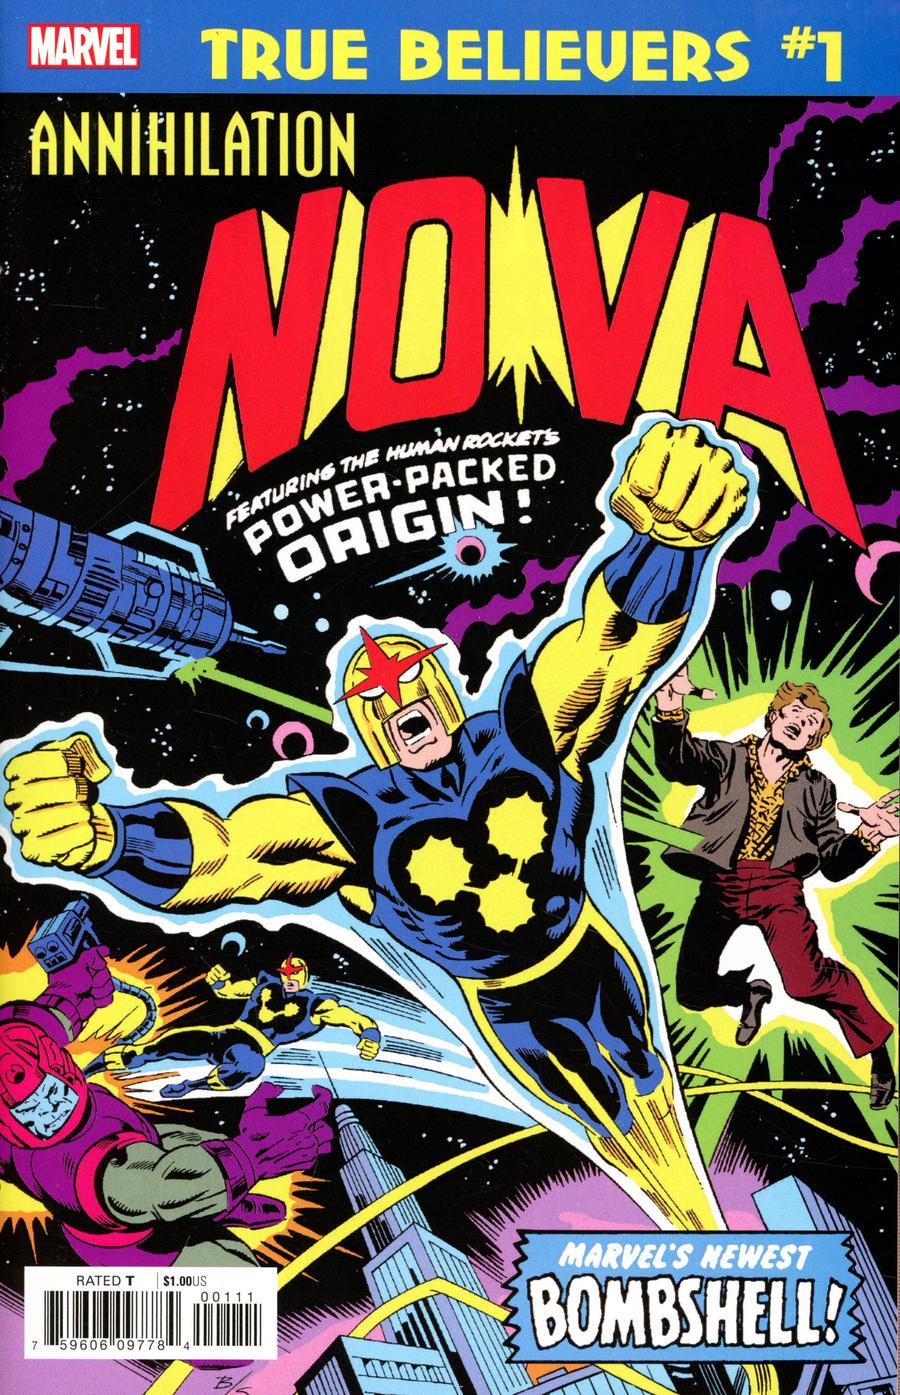 True Believers Annihilation Nova #1